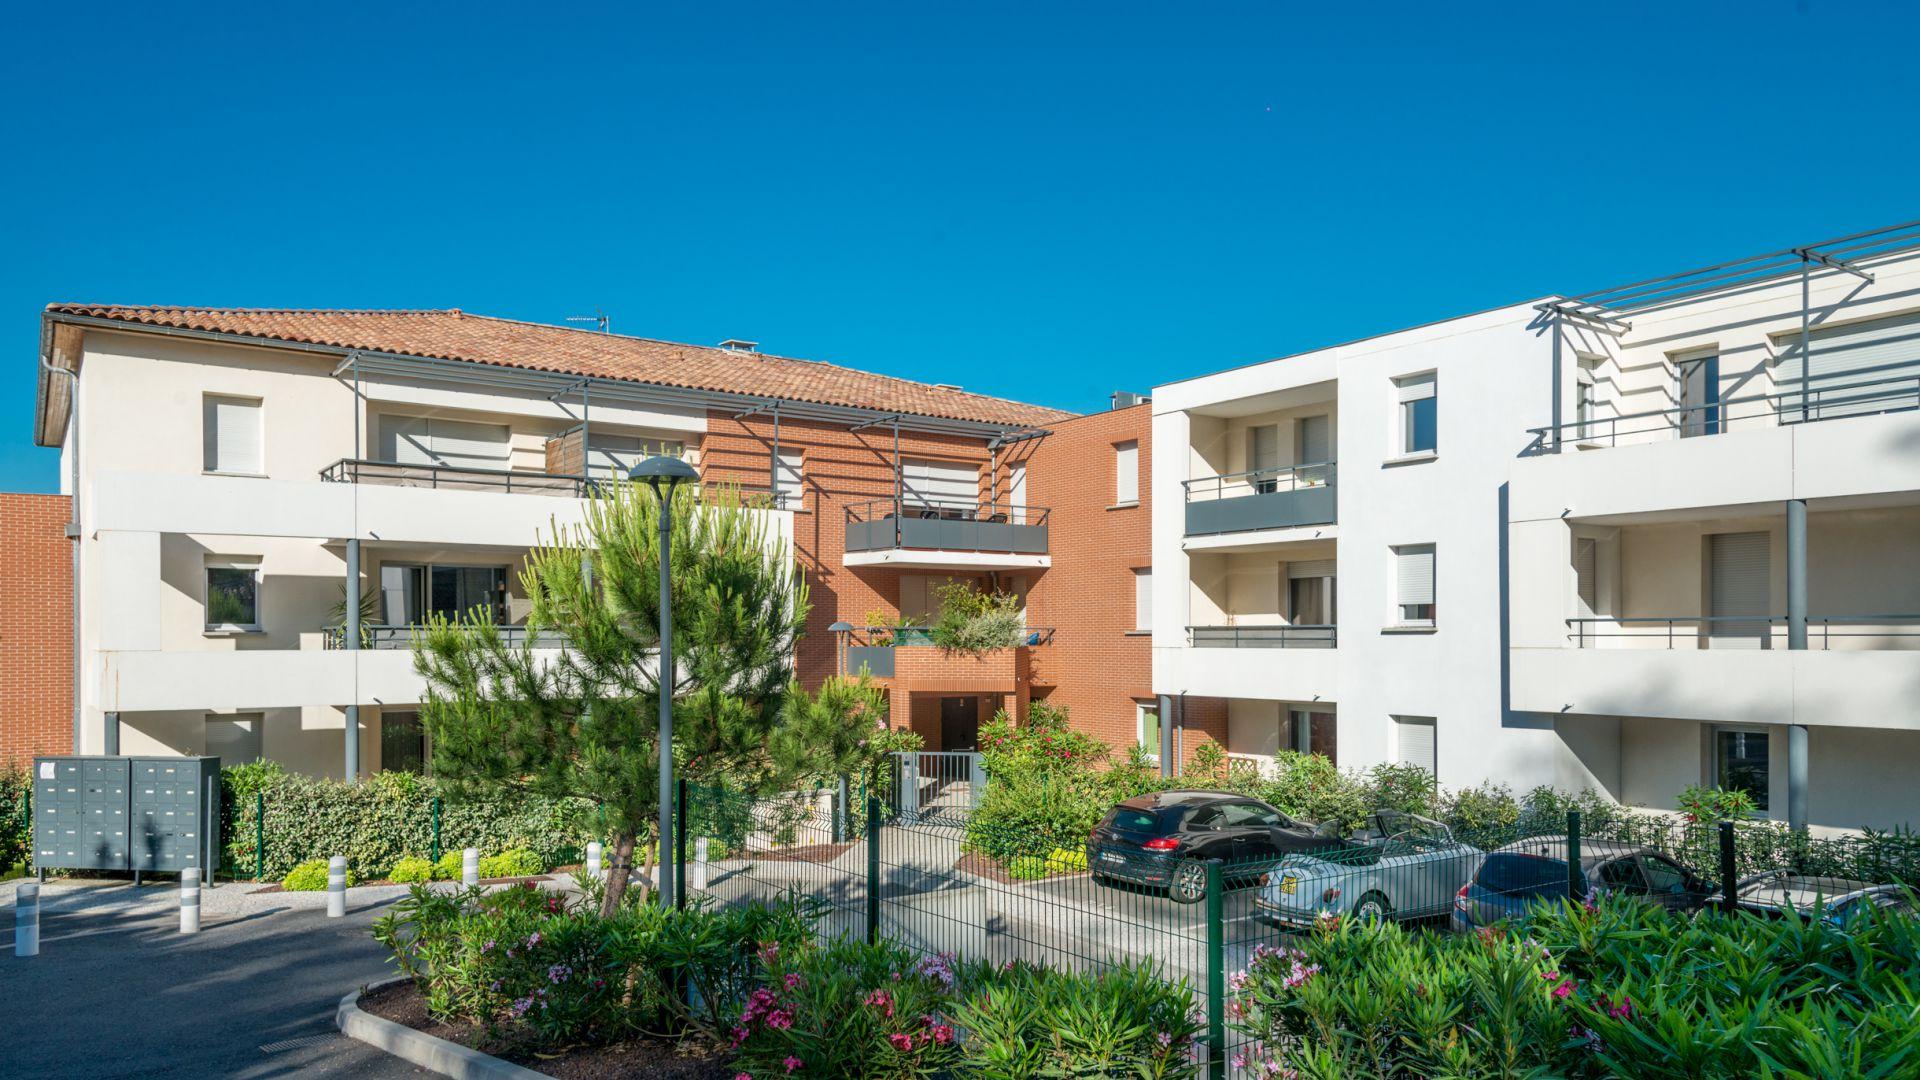 Greencity Immobilier - Résidence Coeur Tolosan - 31320 Castanet tolosan - location